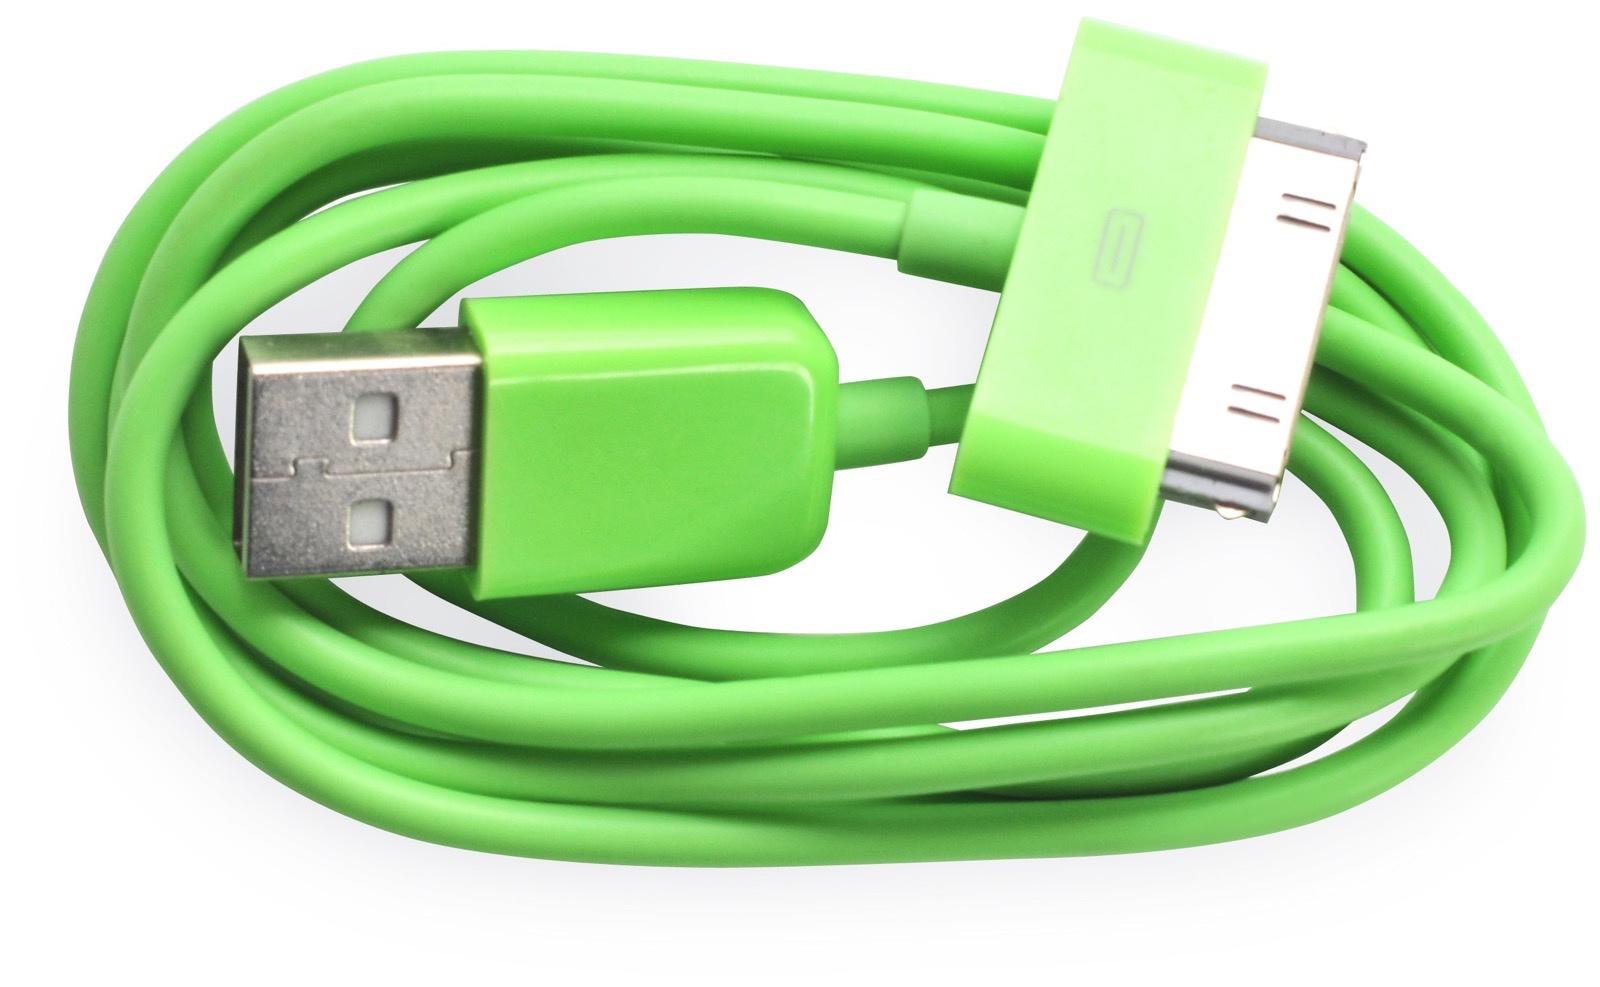 Кабель Gurdini 30- pin 70 см green для Apple iPhone, iPad, iPod, зеленый кабель hama 30 pin apple usb 2 0 черный 1м для apple iphone 3g 3gs 4 4s 00093577